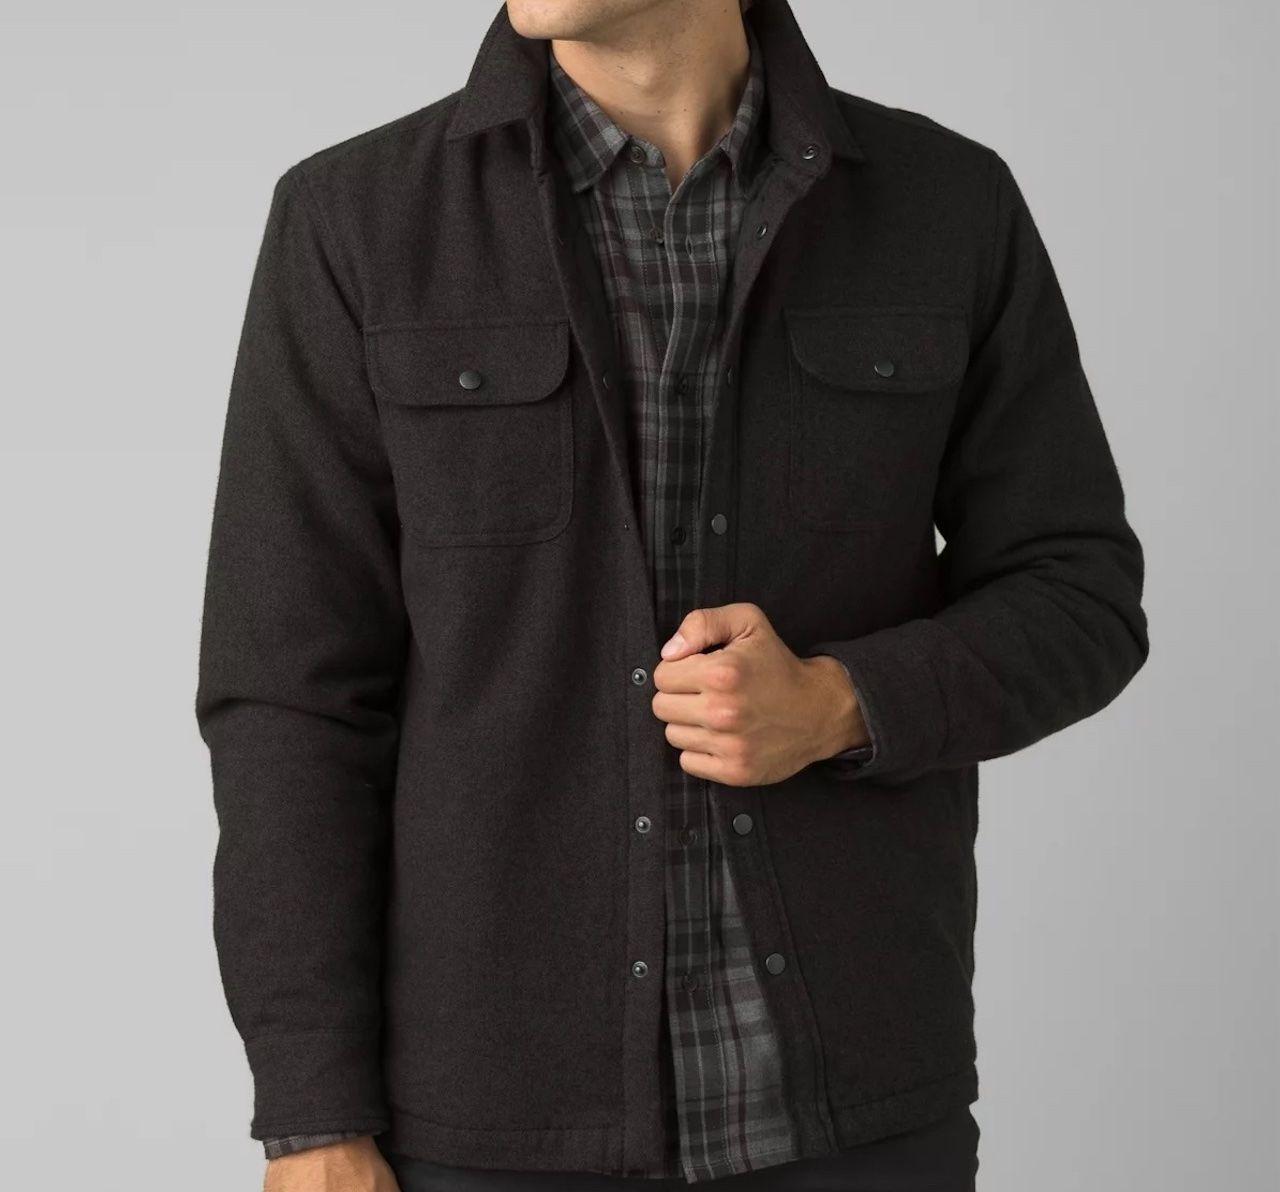 comfortable travel clothes Men prAna dock jacket